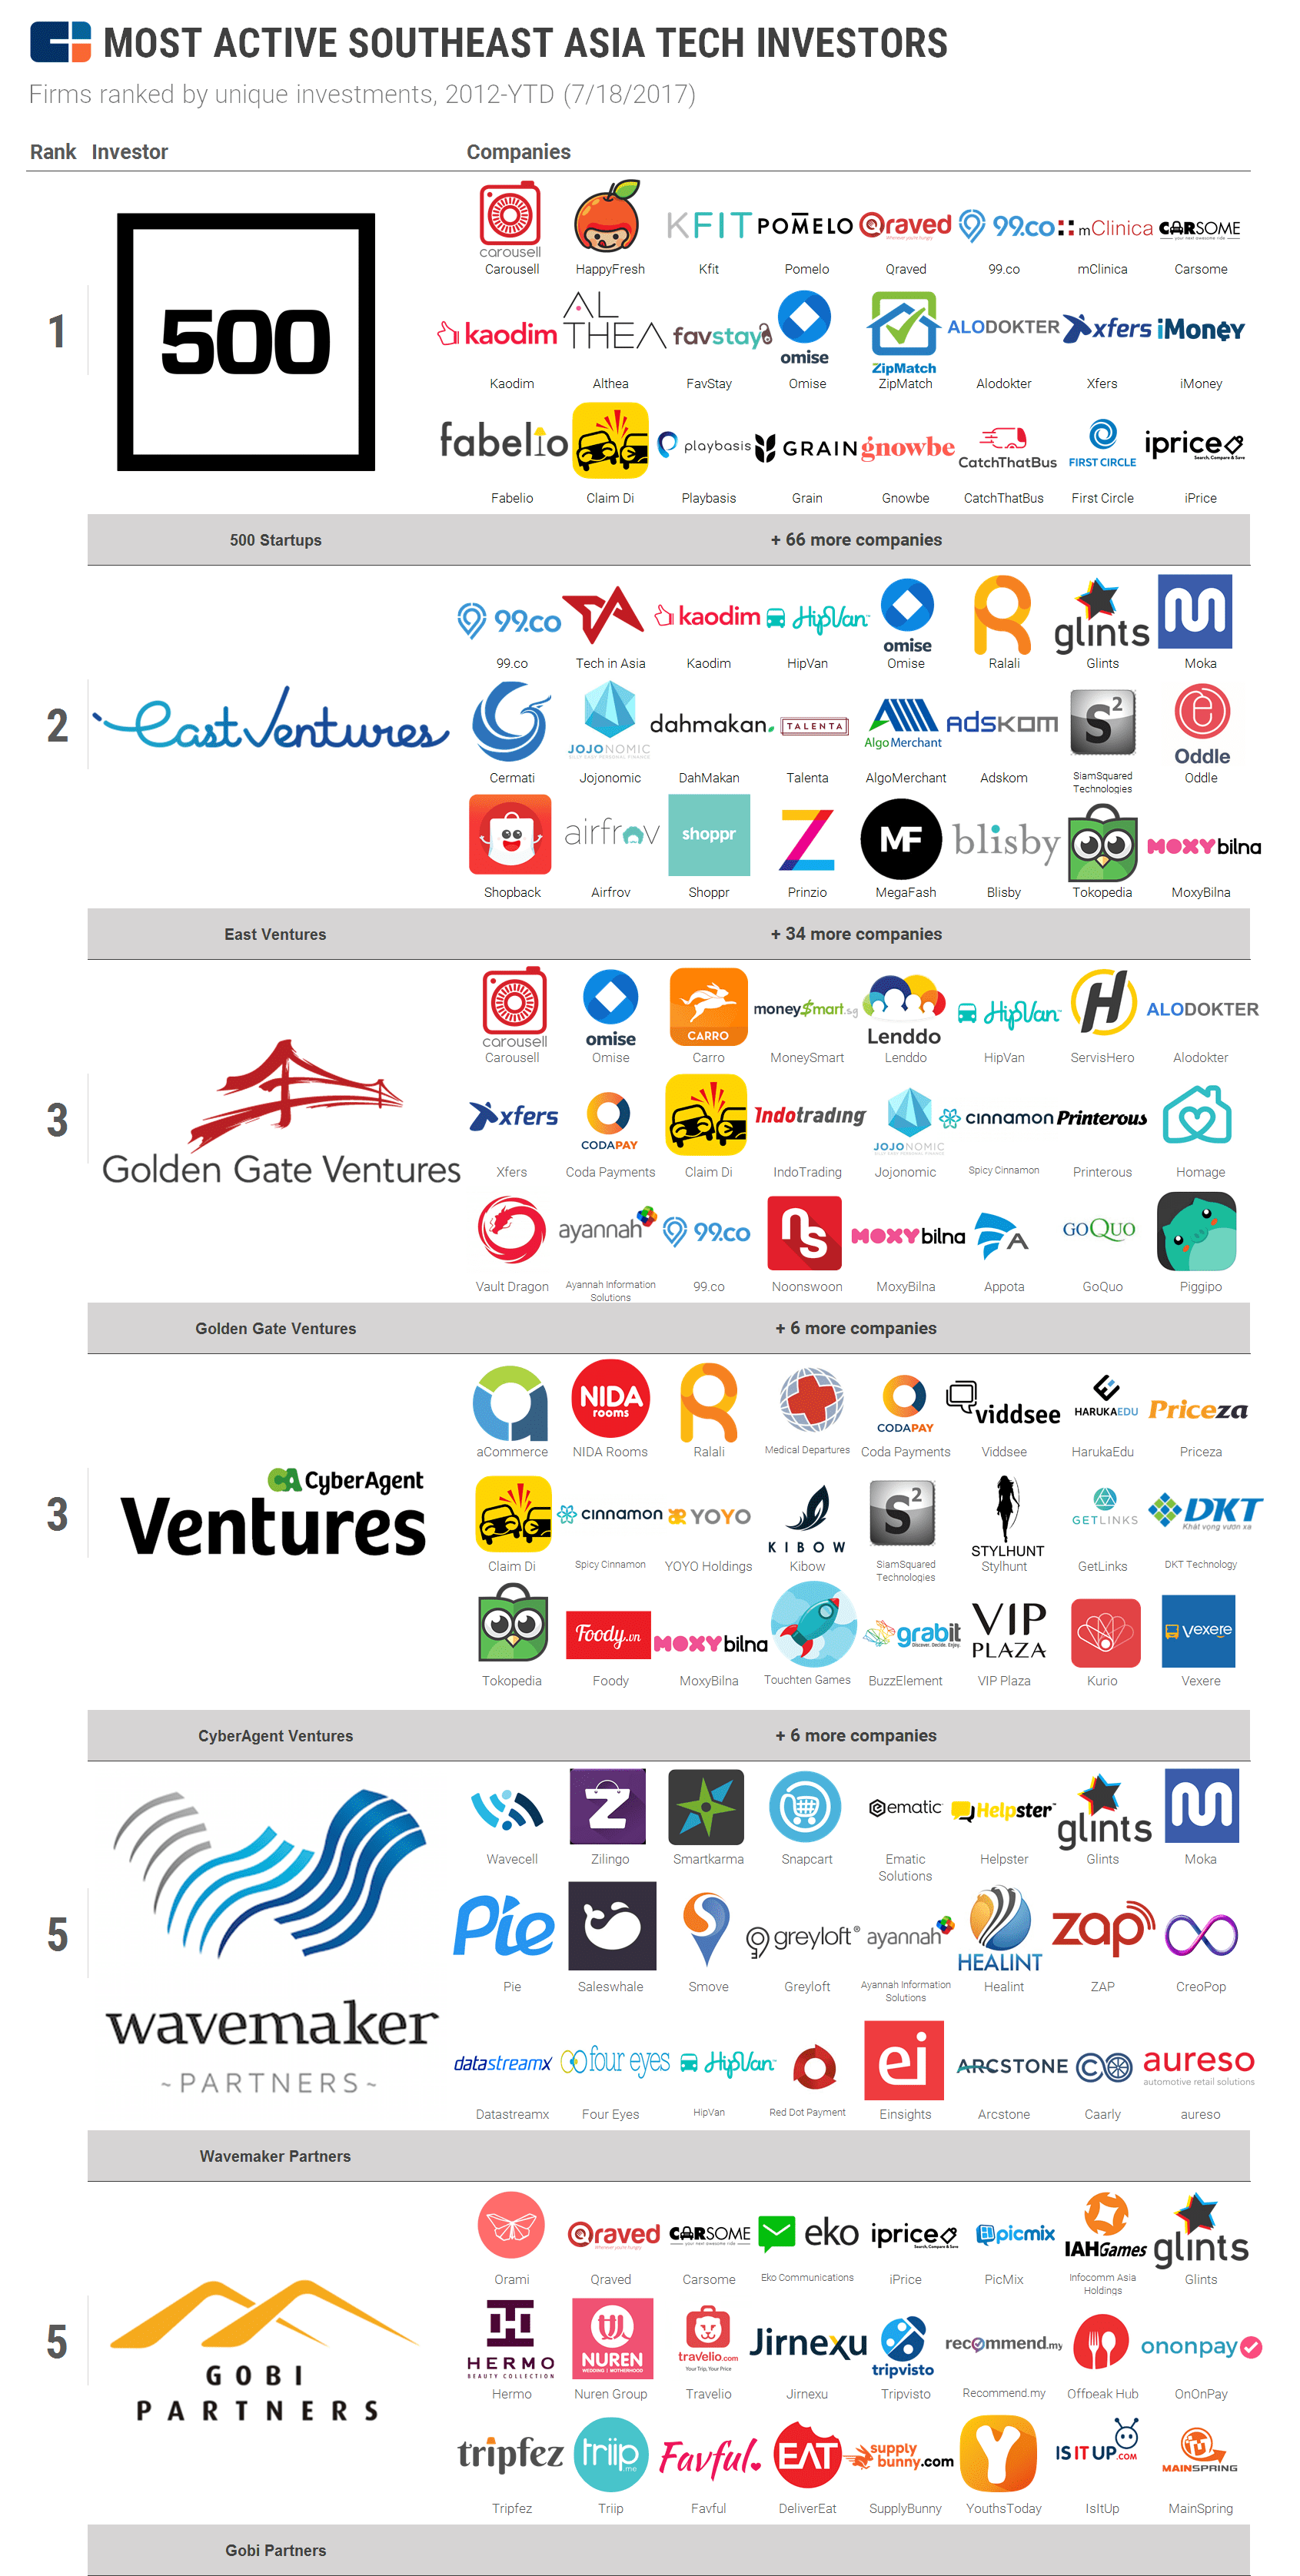 Southeast Asia's Most Active Tech Investors